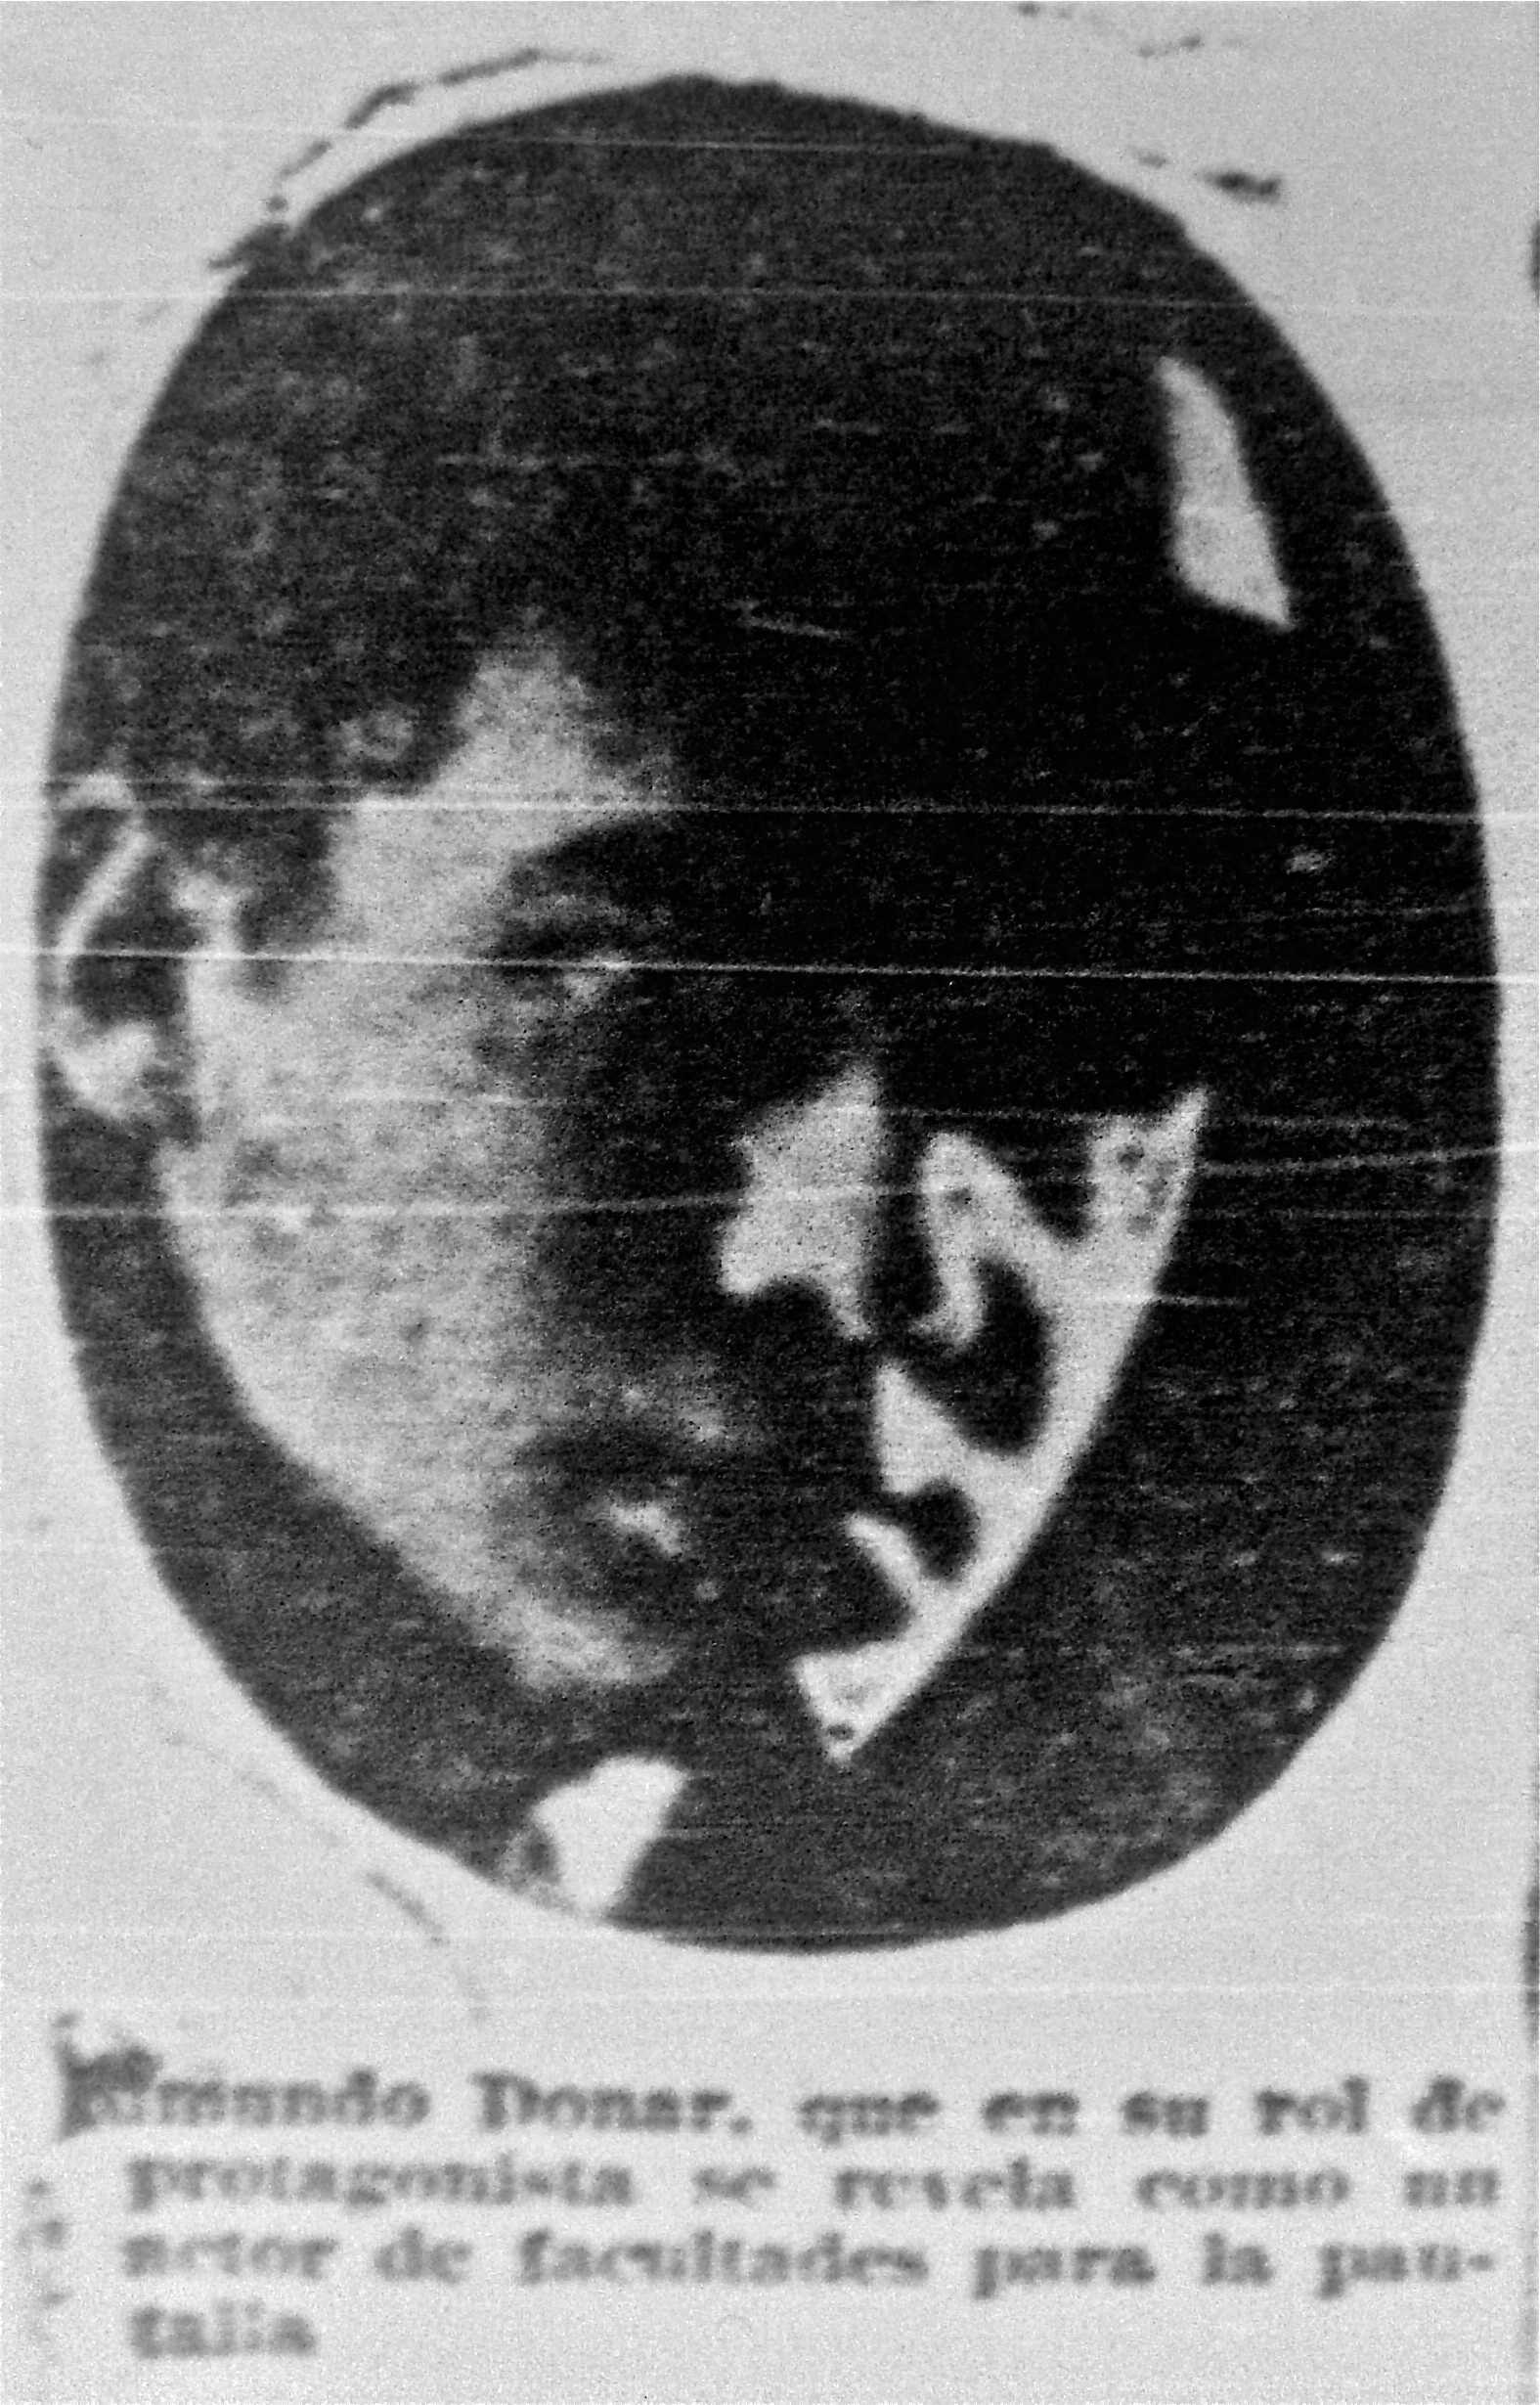 1920-10-25_LUNStgo; HoyPresentaAlhambra_UnodeAbajo (4foto_donar)_29032013.JPG